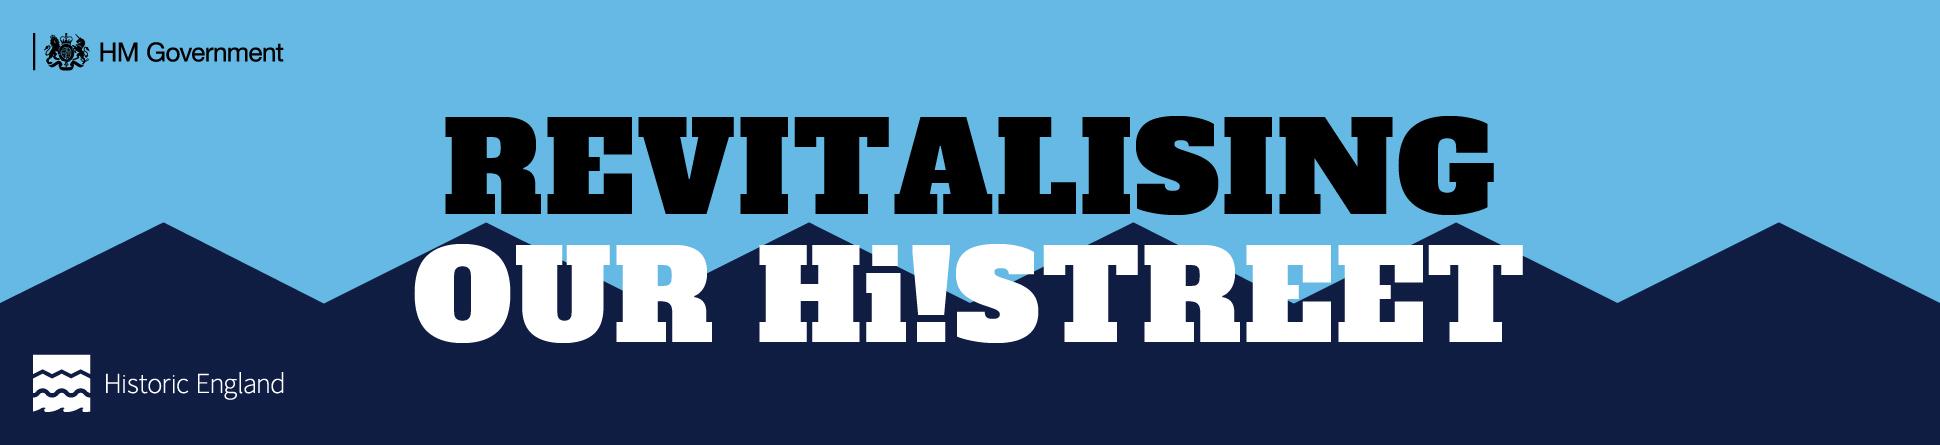 Revitalising our Hi!Street banner